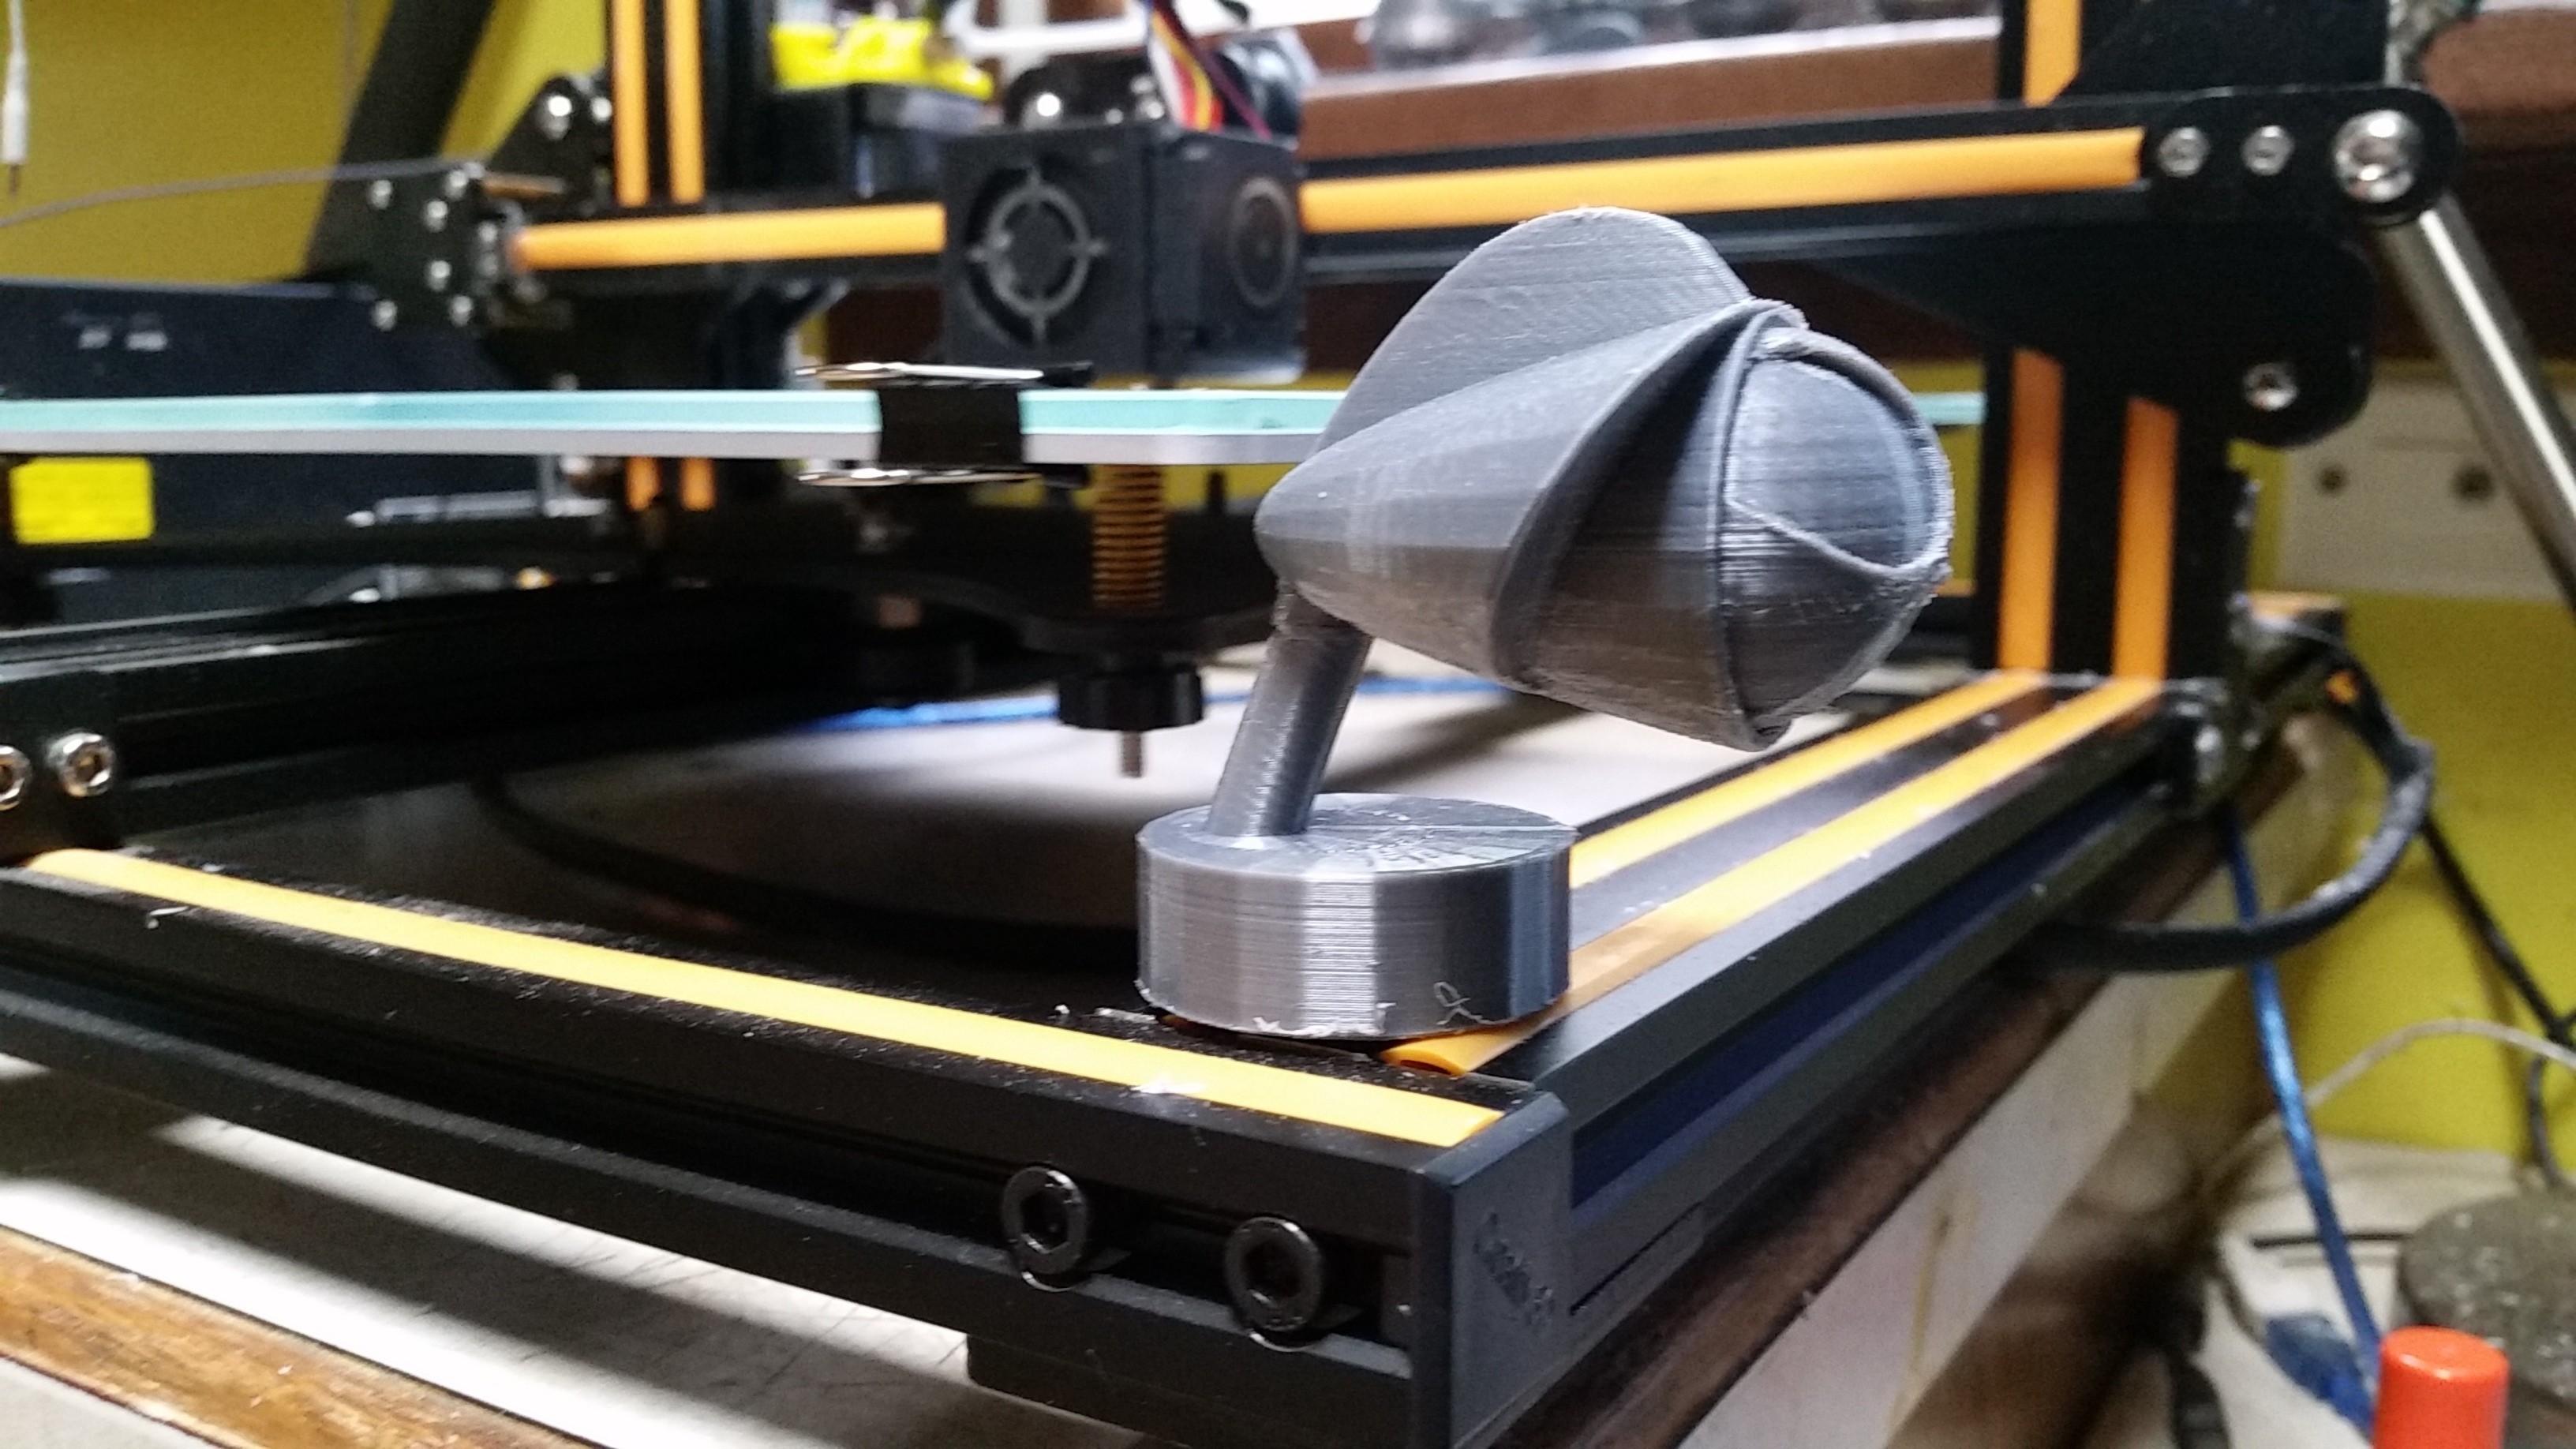 20180610_130920.jpg Download STL file war of the worlds alien  • 3D printing template, platt980